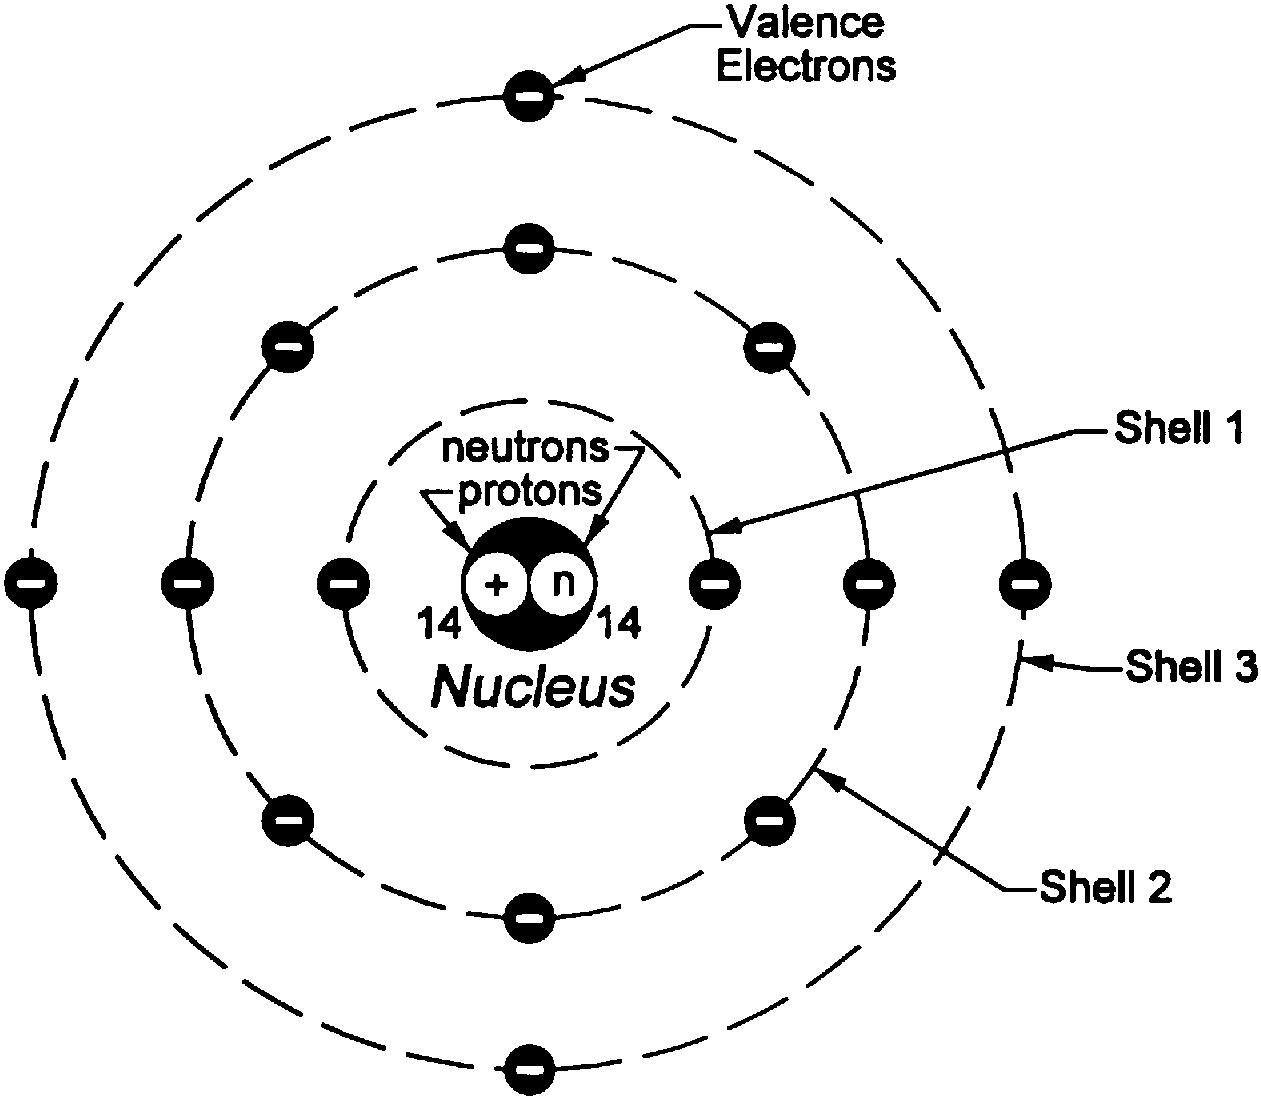 bohr model of silicon atom | electronics and engineering lab bohr diagram silicon atom energy level diagram hydrogen atom bohr model figure 4 5 #3